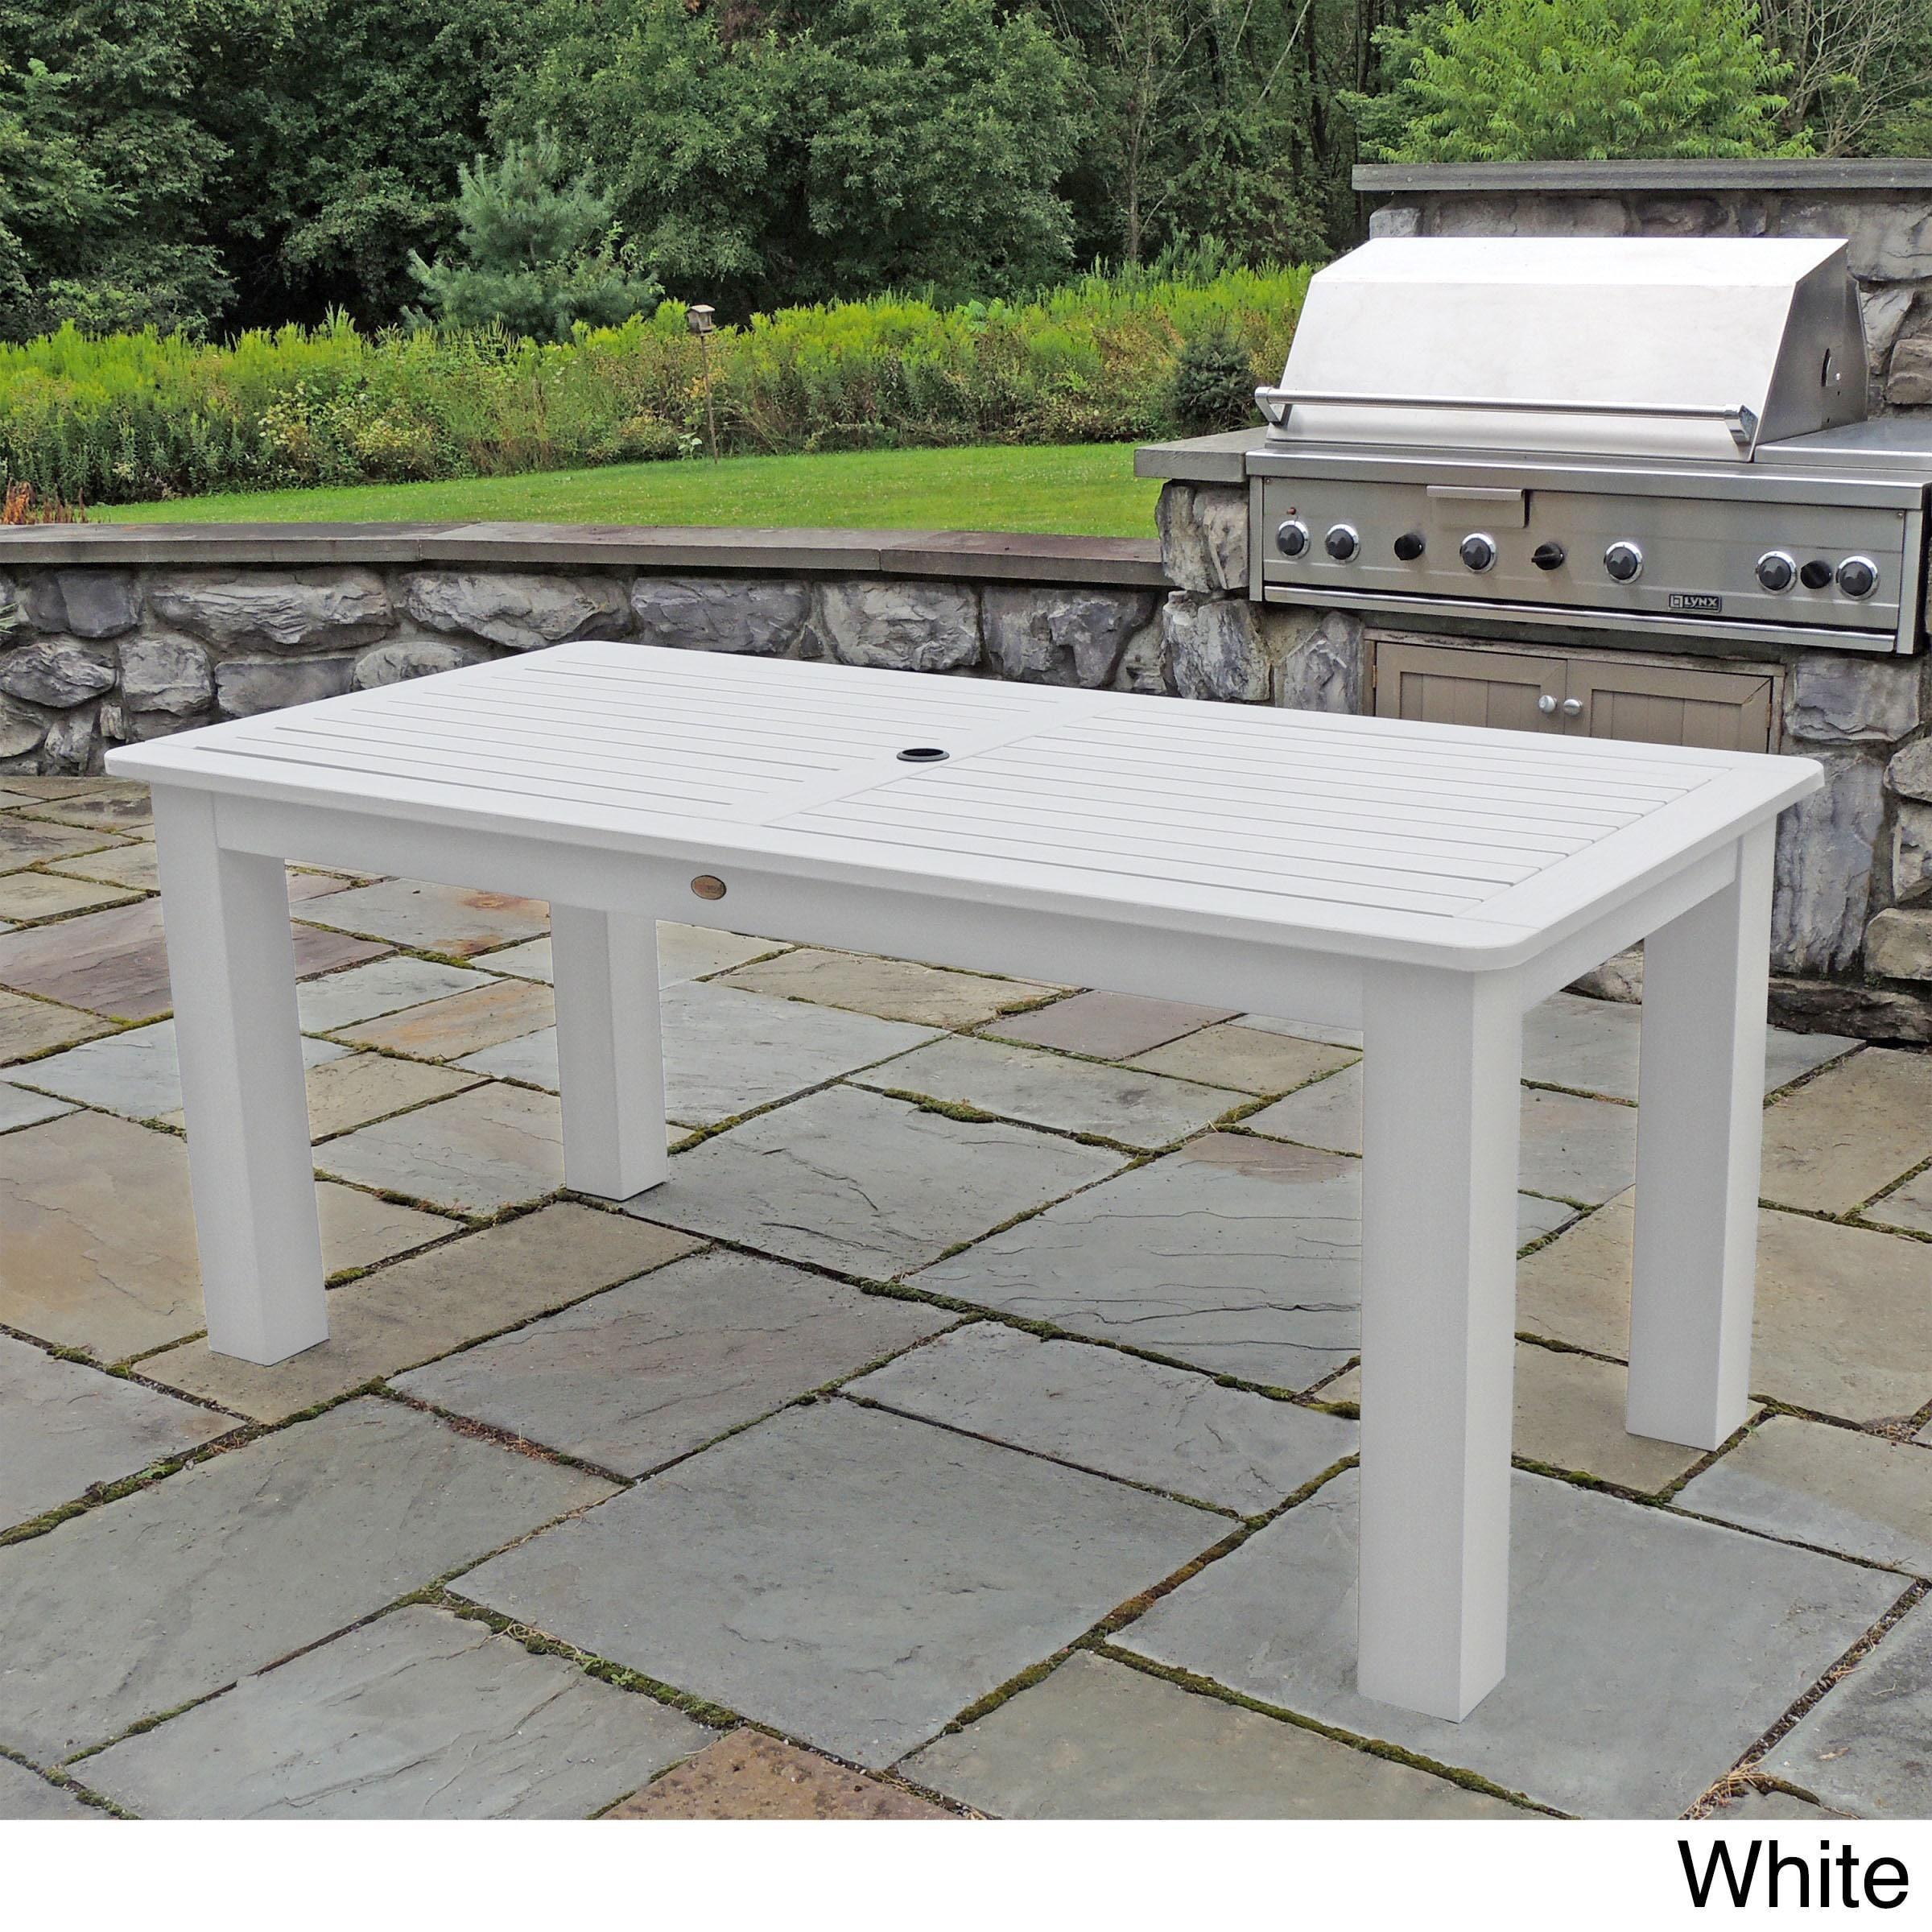 Highwood Eco friendly Synthetic Wood 37 x 72 inch Rectangular